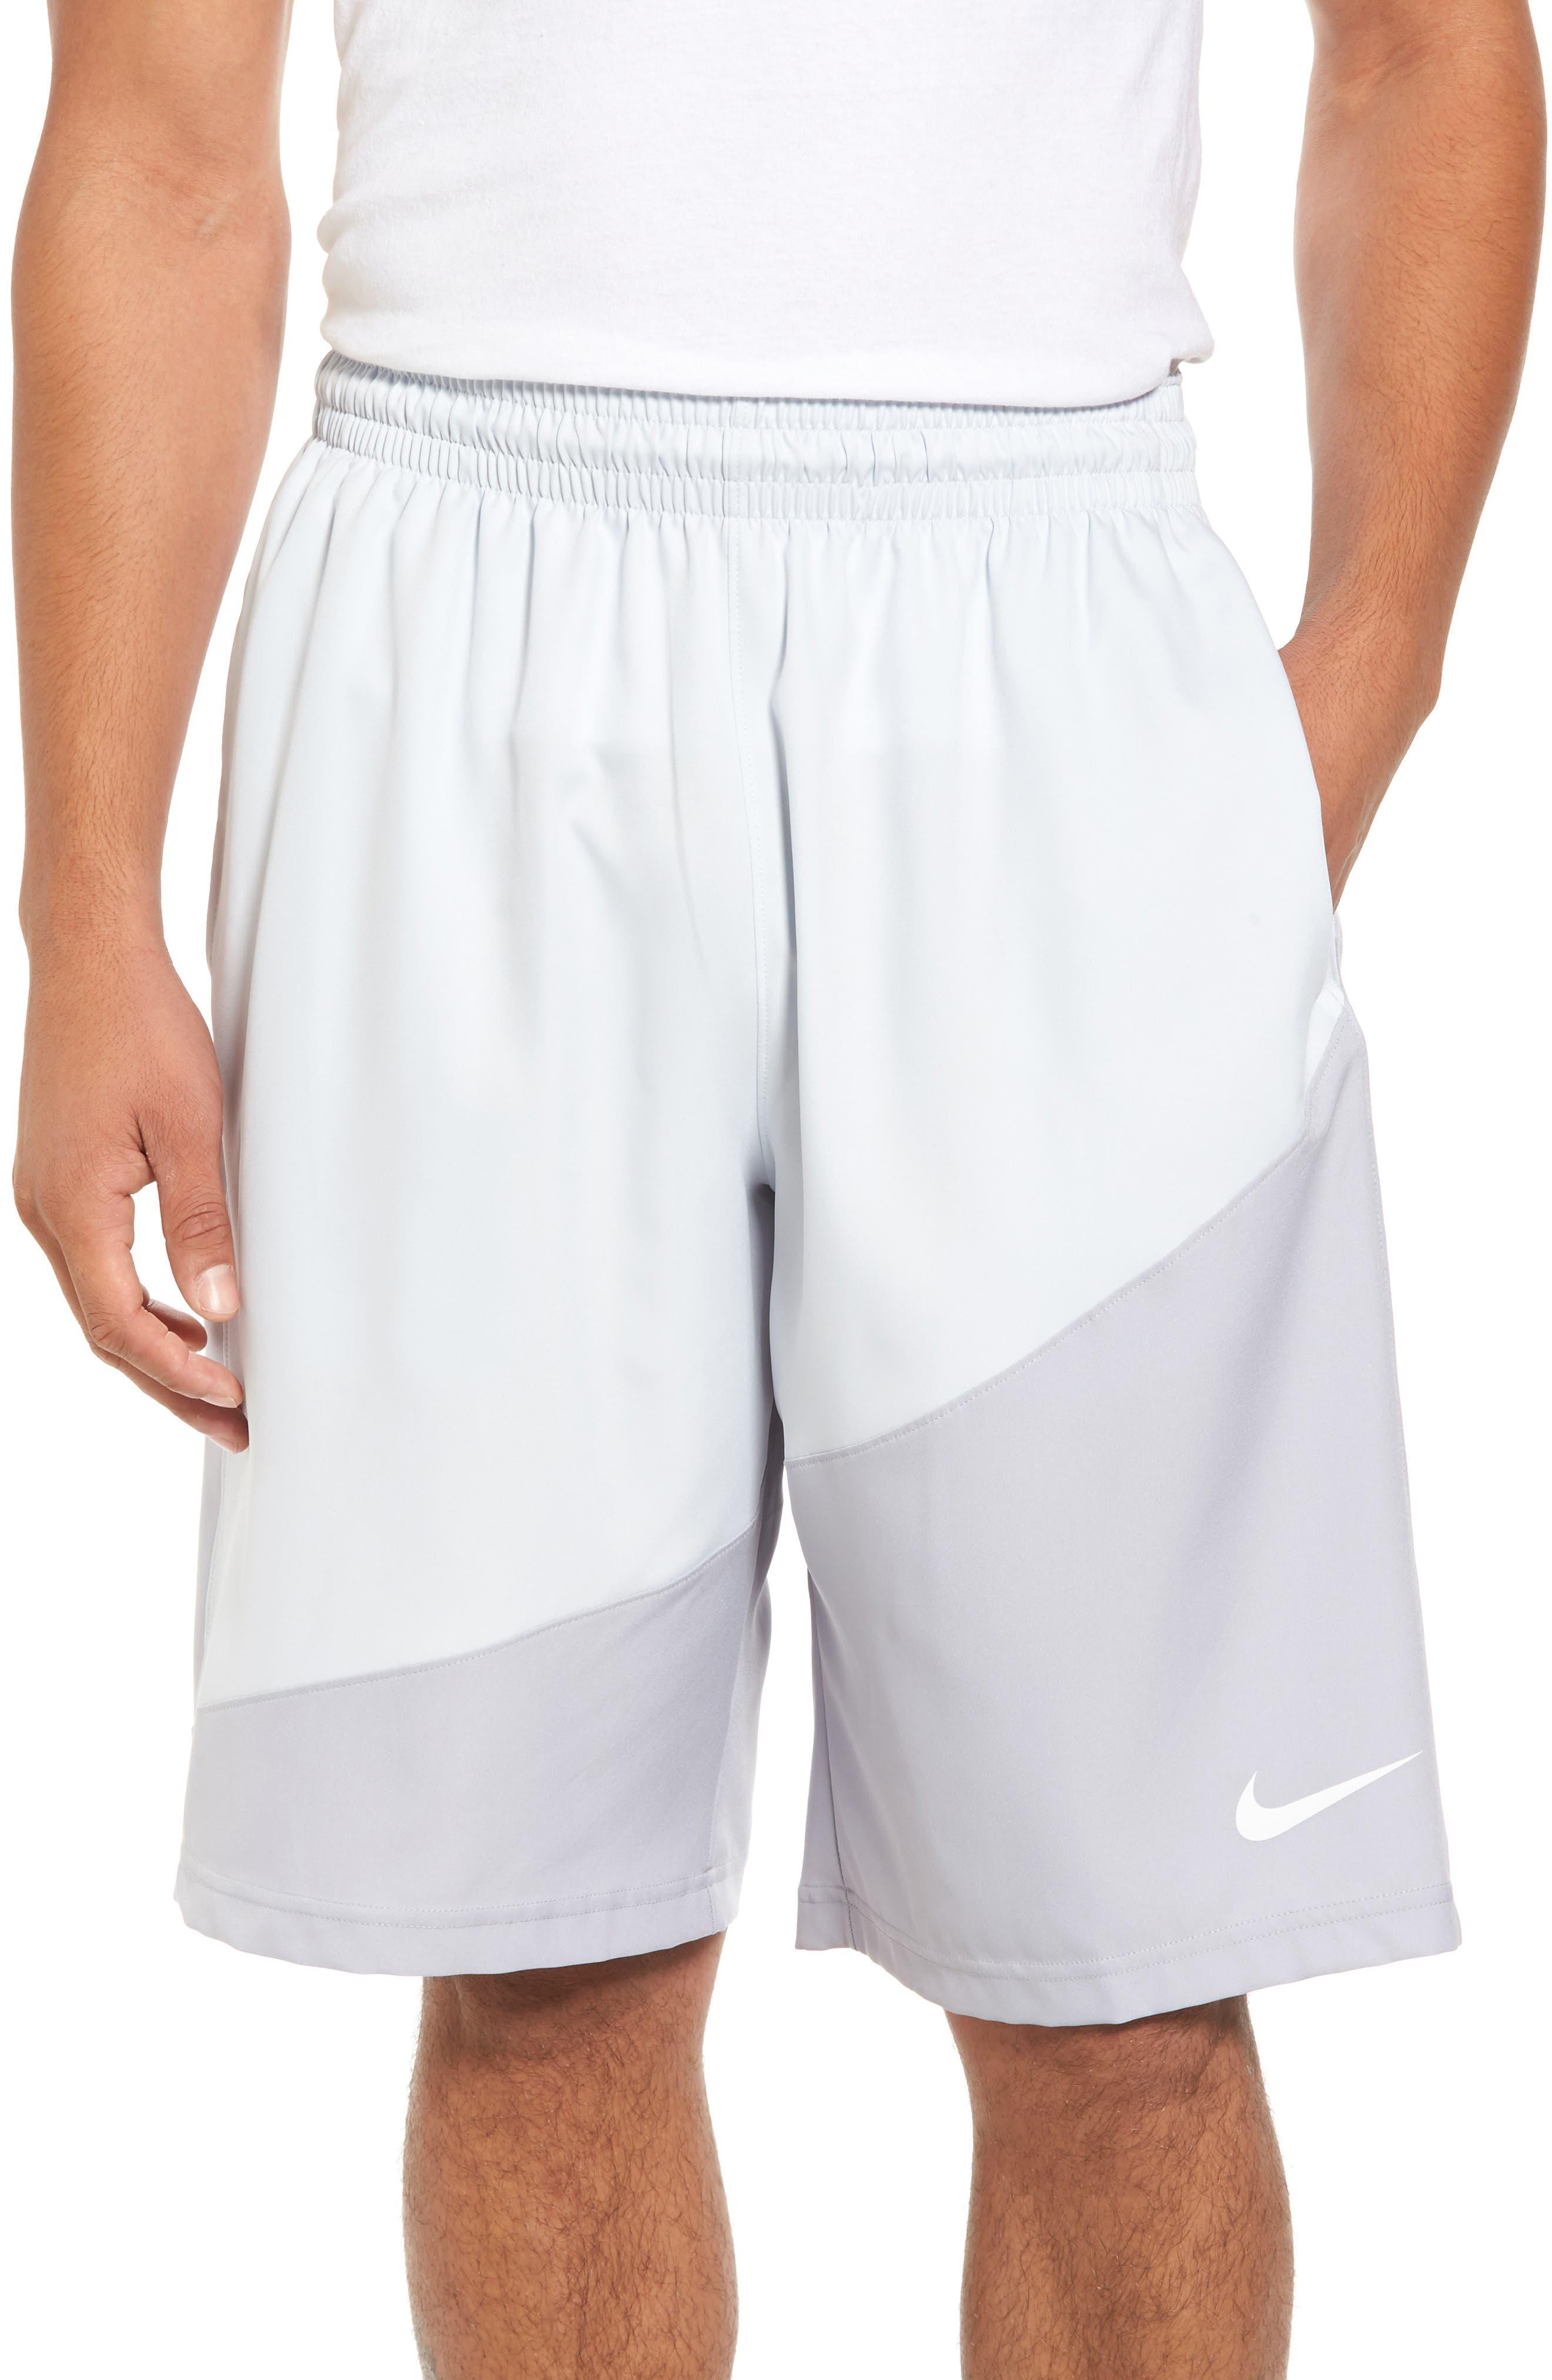 Dry Shorts,                             Main thumbnail 1, color,                             Atmosphere Grey/ Smoke/ Black